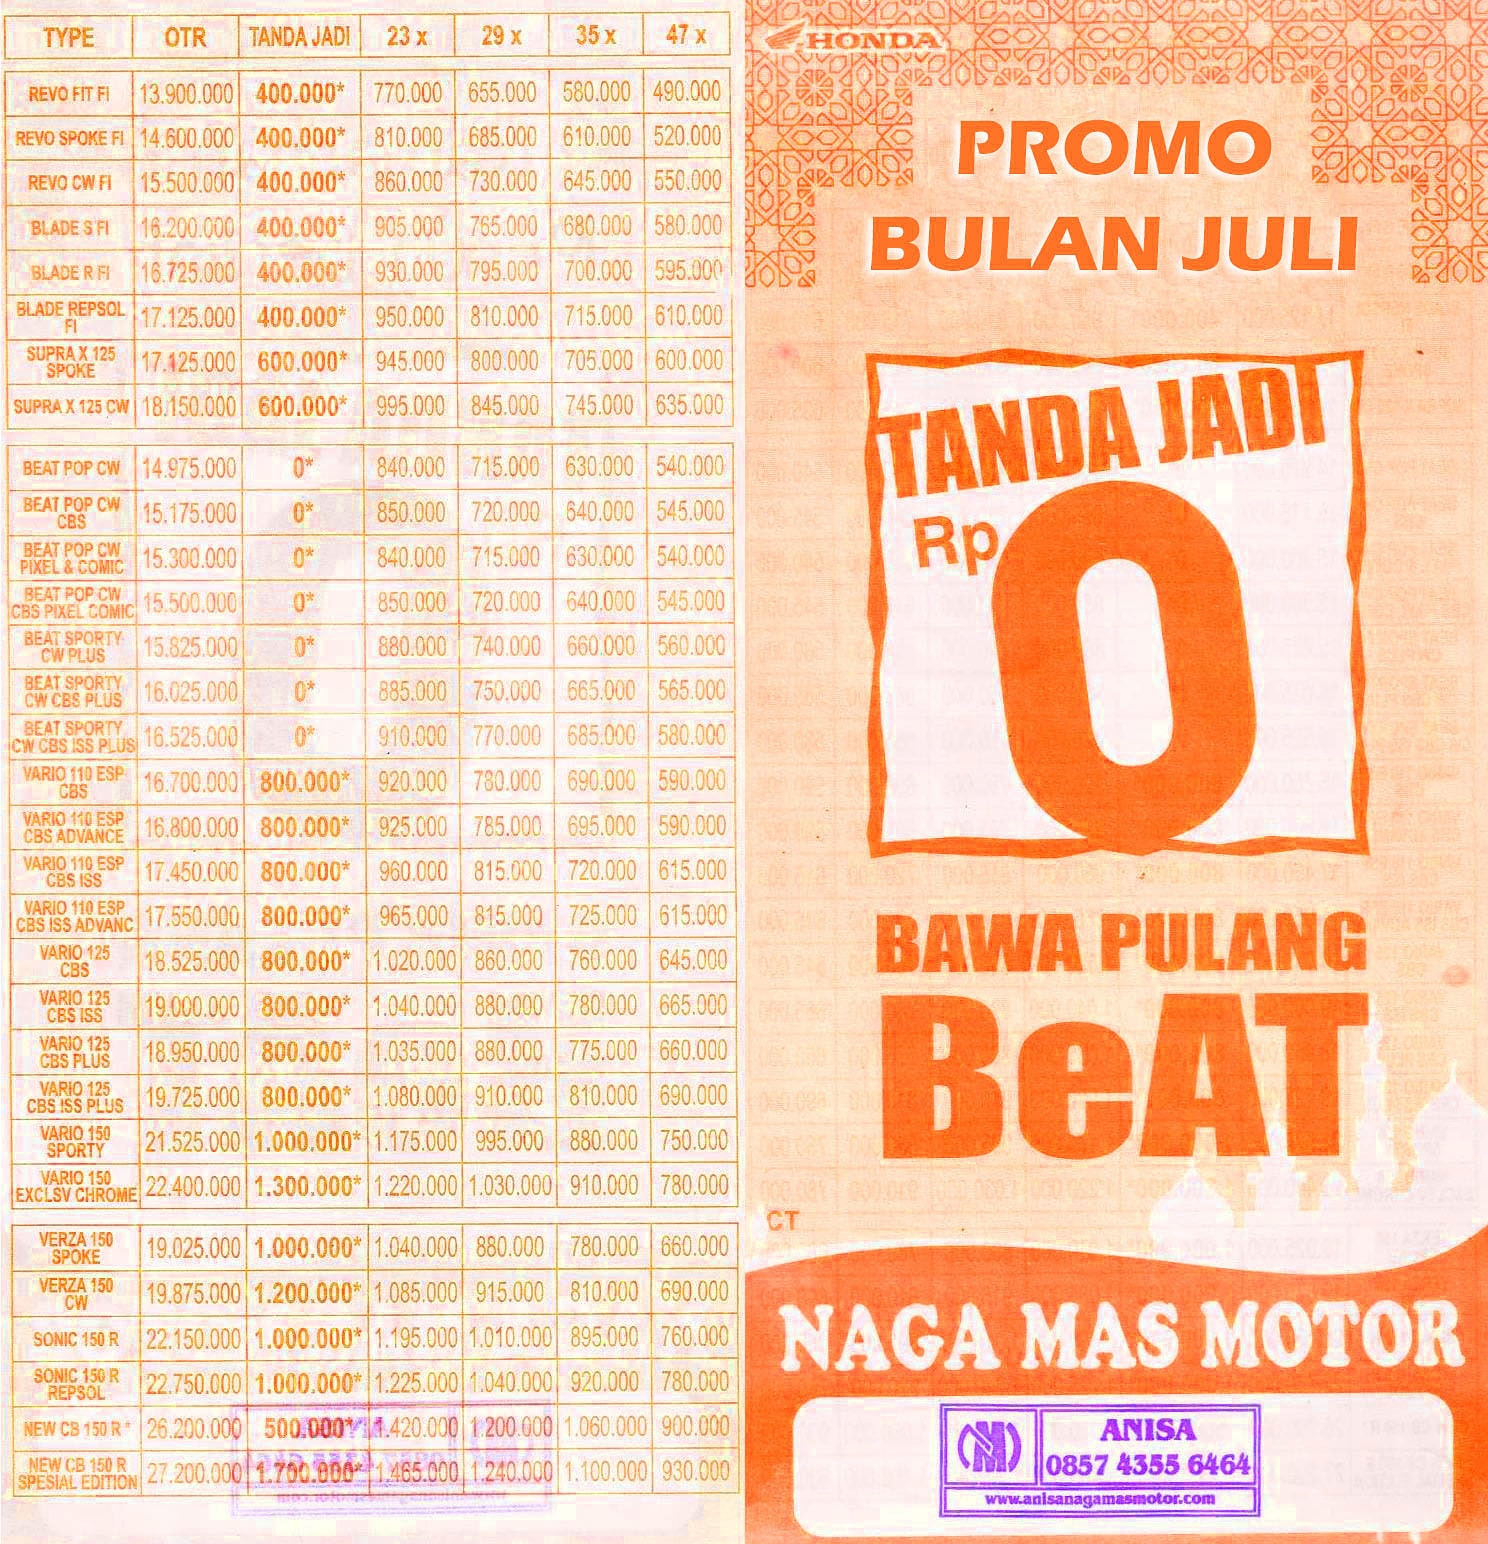 Anisa Counter Sales Dealer Nagamas Motor Klaten All New Beat Sporty Esp Cbs Funk Red Black Kudus Promo Juli